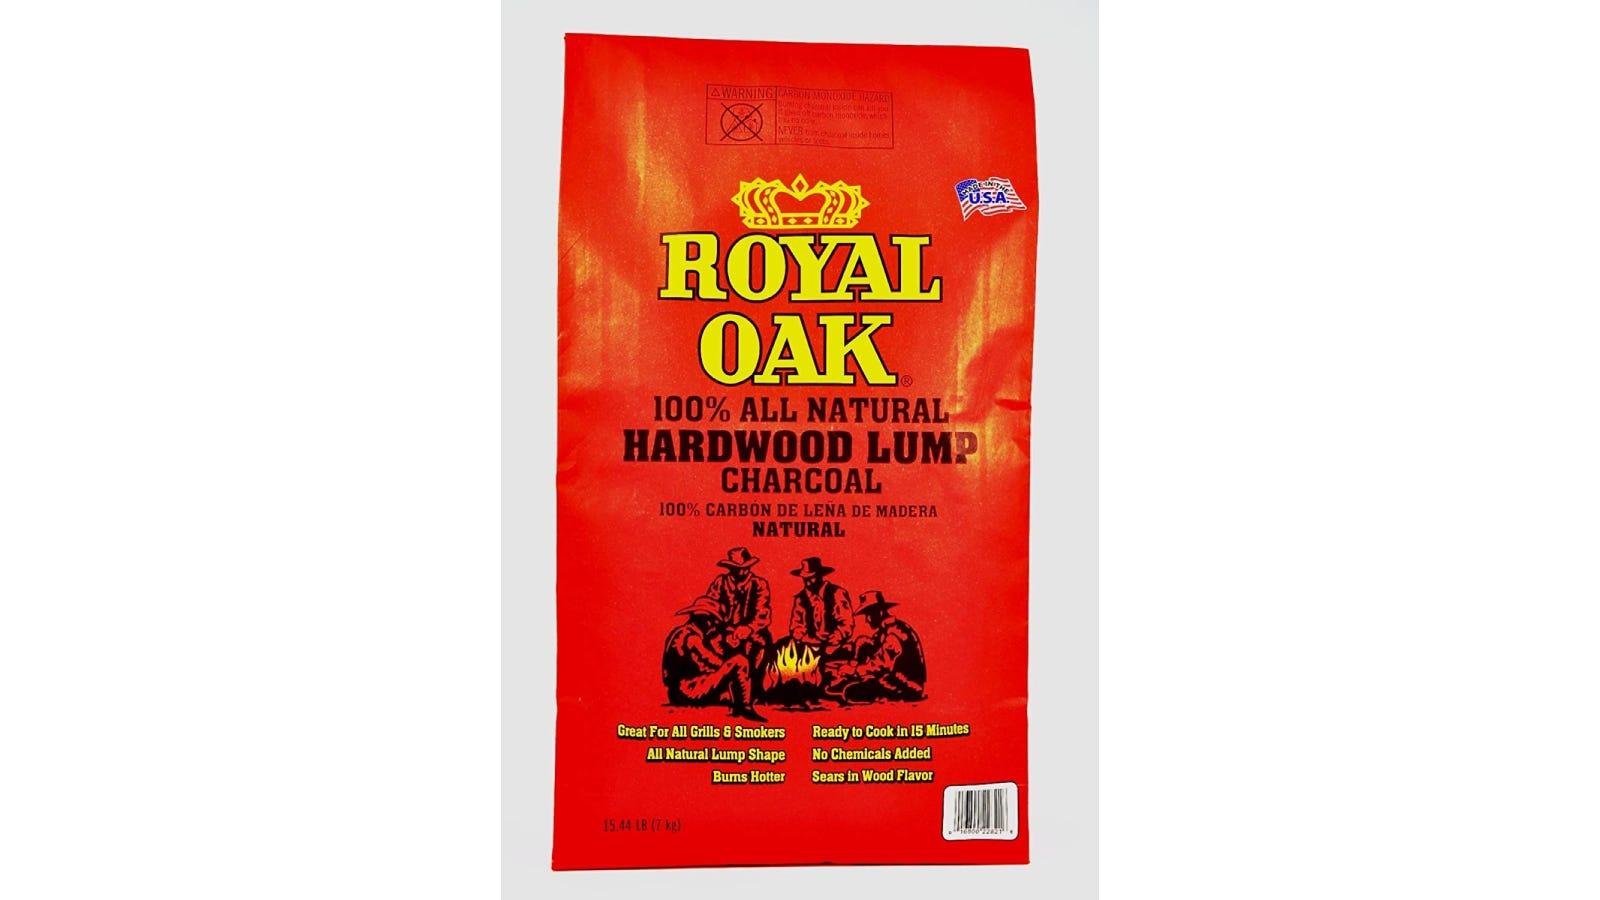 A red bag of Royal Oak charcoal.